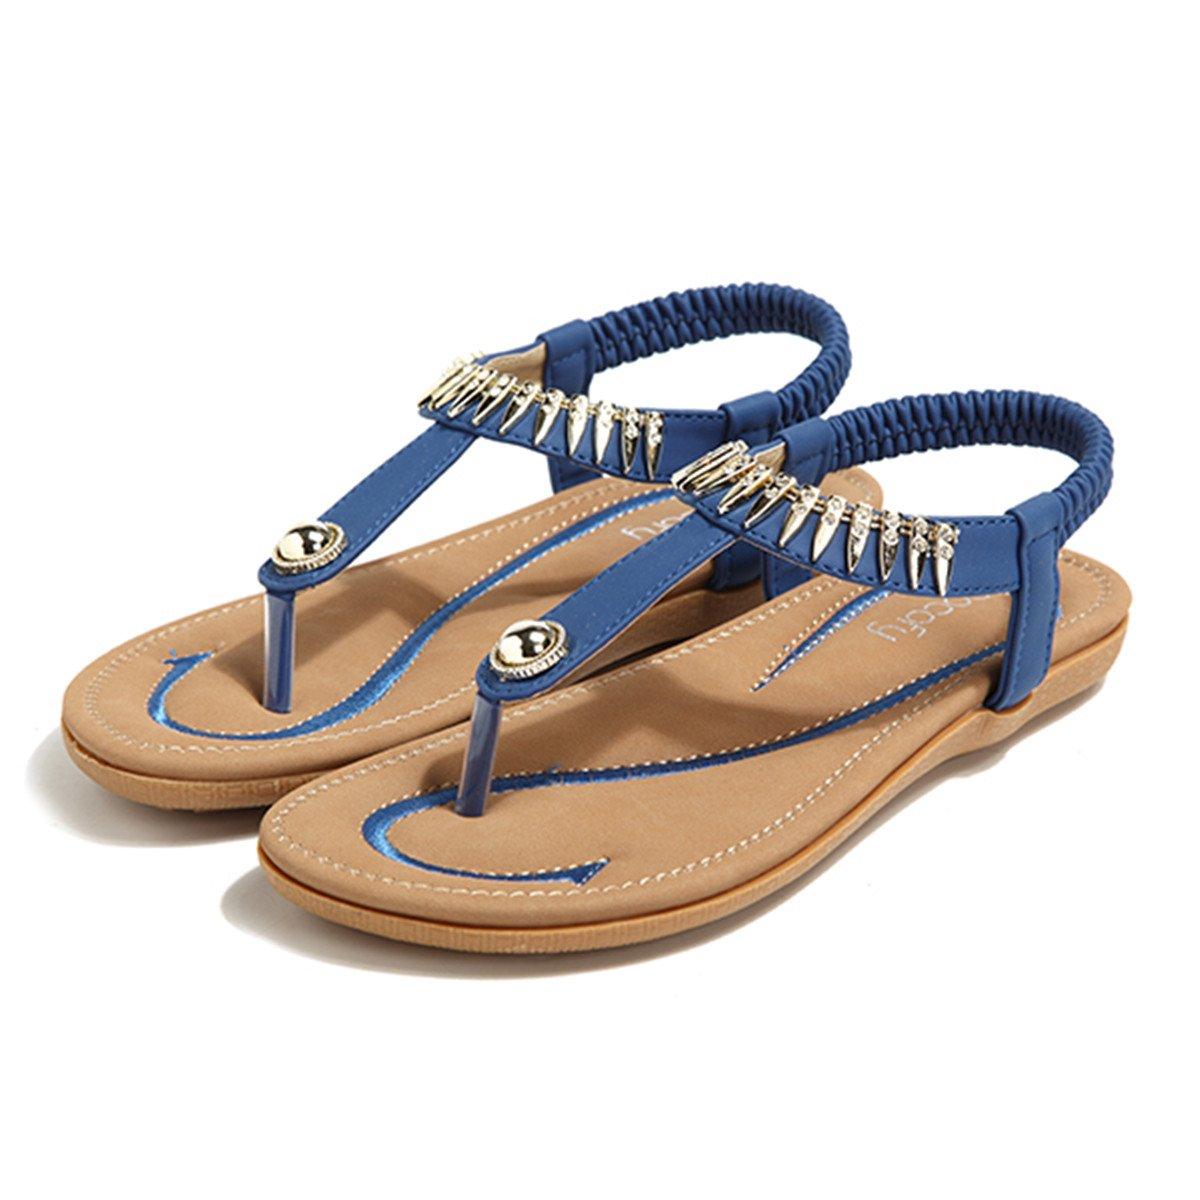 Socofy Bohemian Sandals,Women's Metal Elastic Flat Sandals Summer Bohemia Style Clip Toe Flip Flops Shoes Blue 9 B(M) US by Socofy (Image #3)